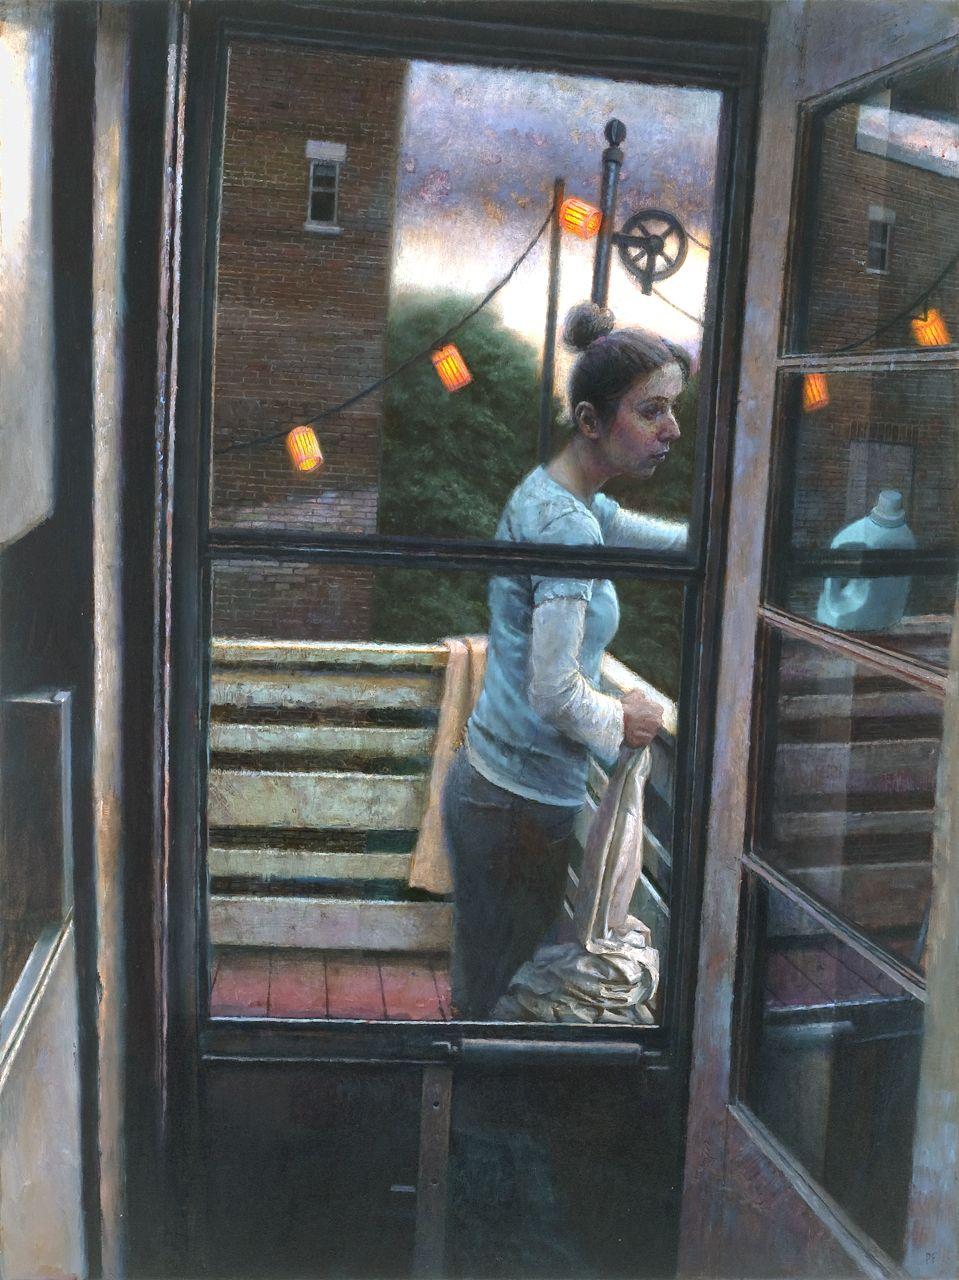 Paul Fenniak, Out of Reach, 2011, oil on canvas, 48 x 36 inches